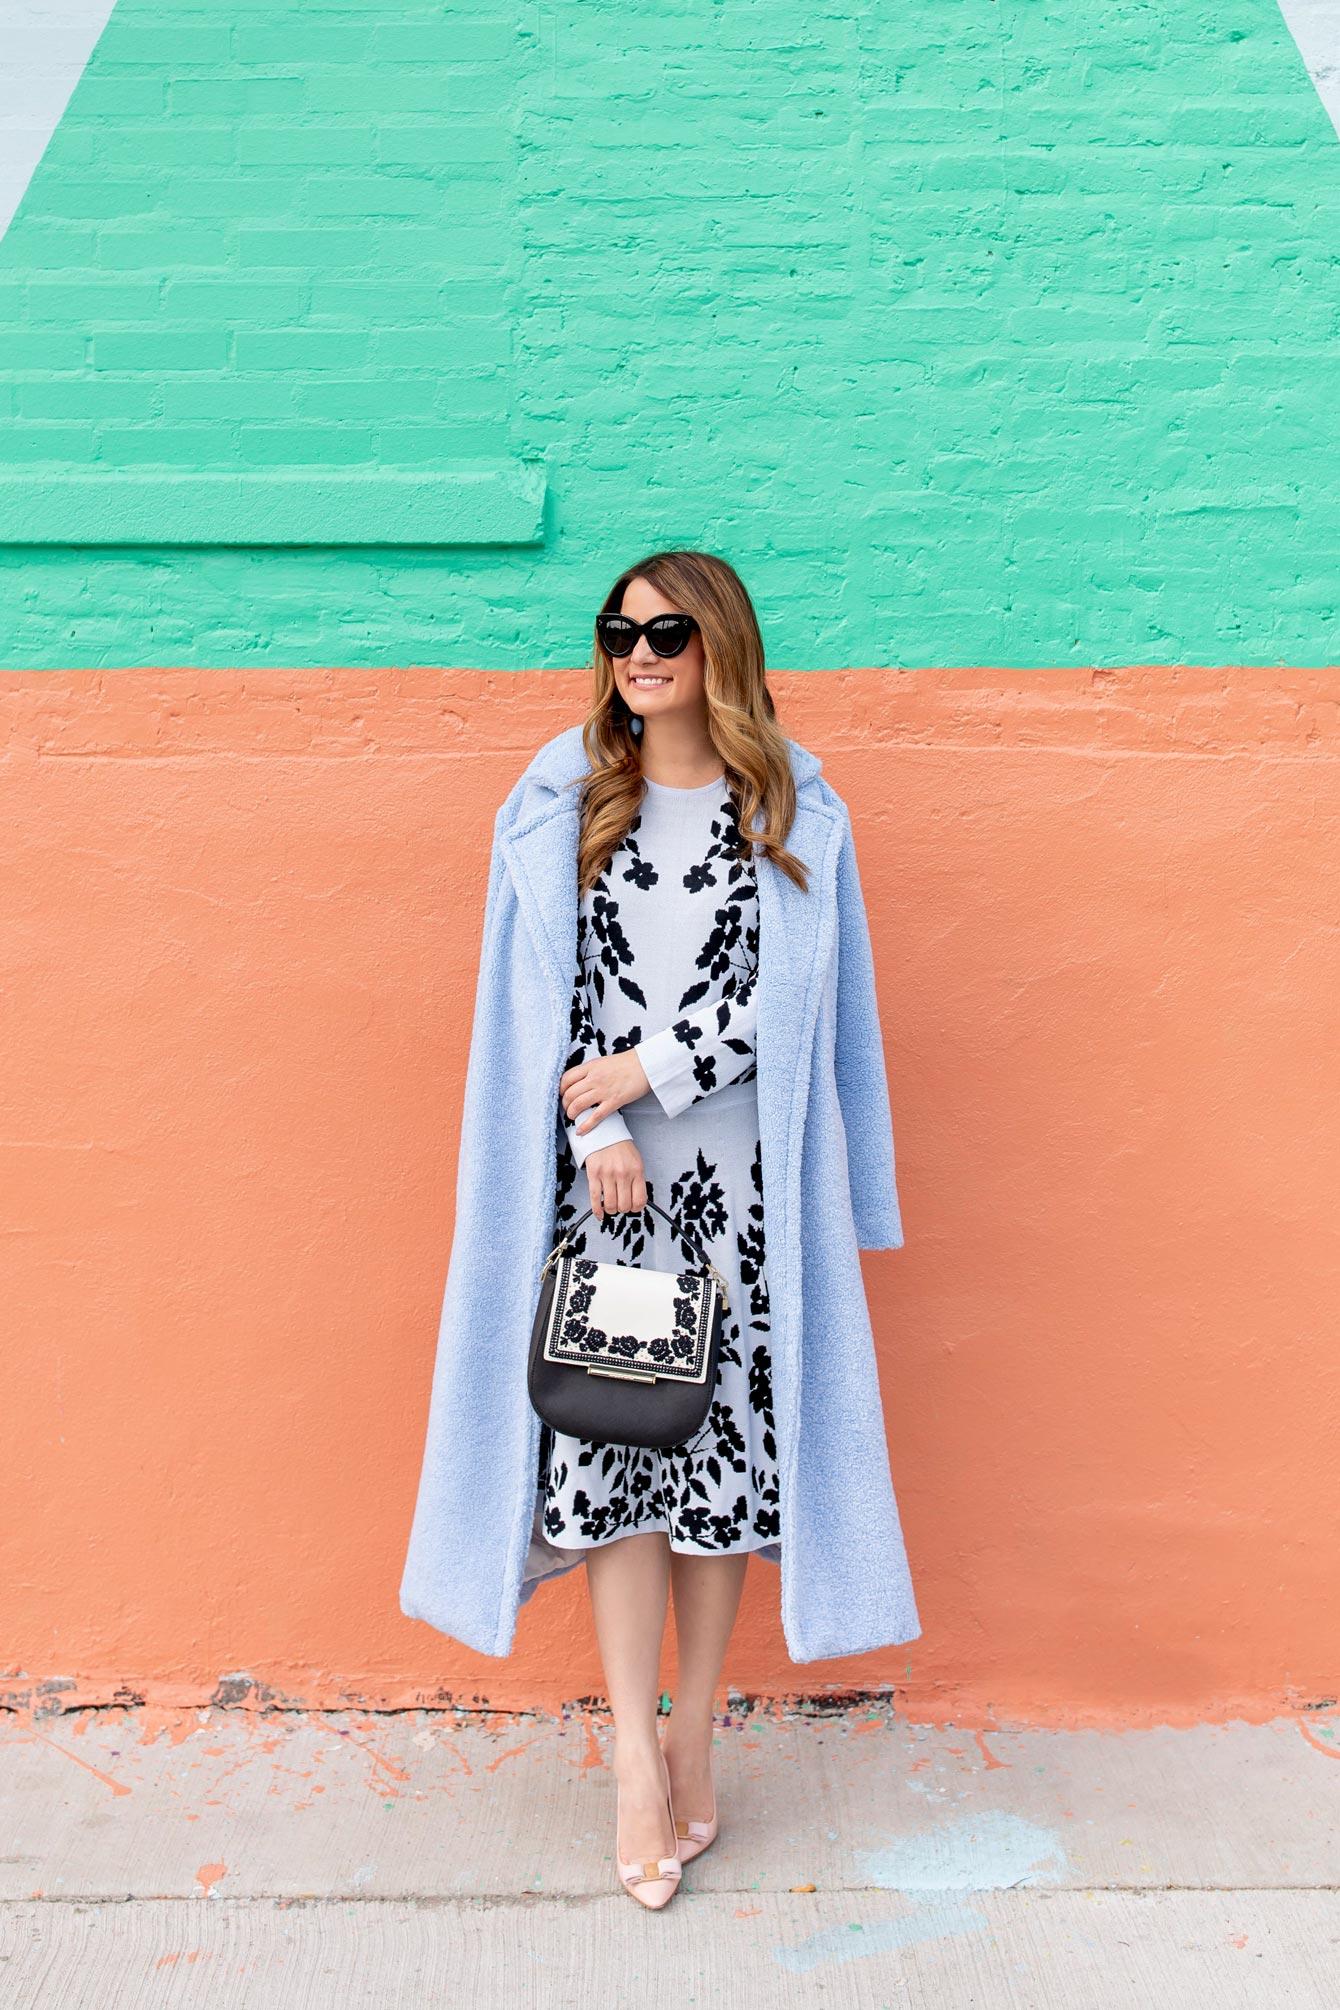 Kate Spade New York Make It Mine Bag